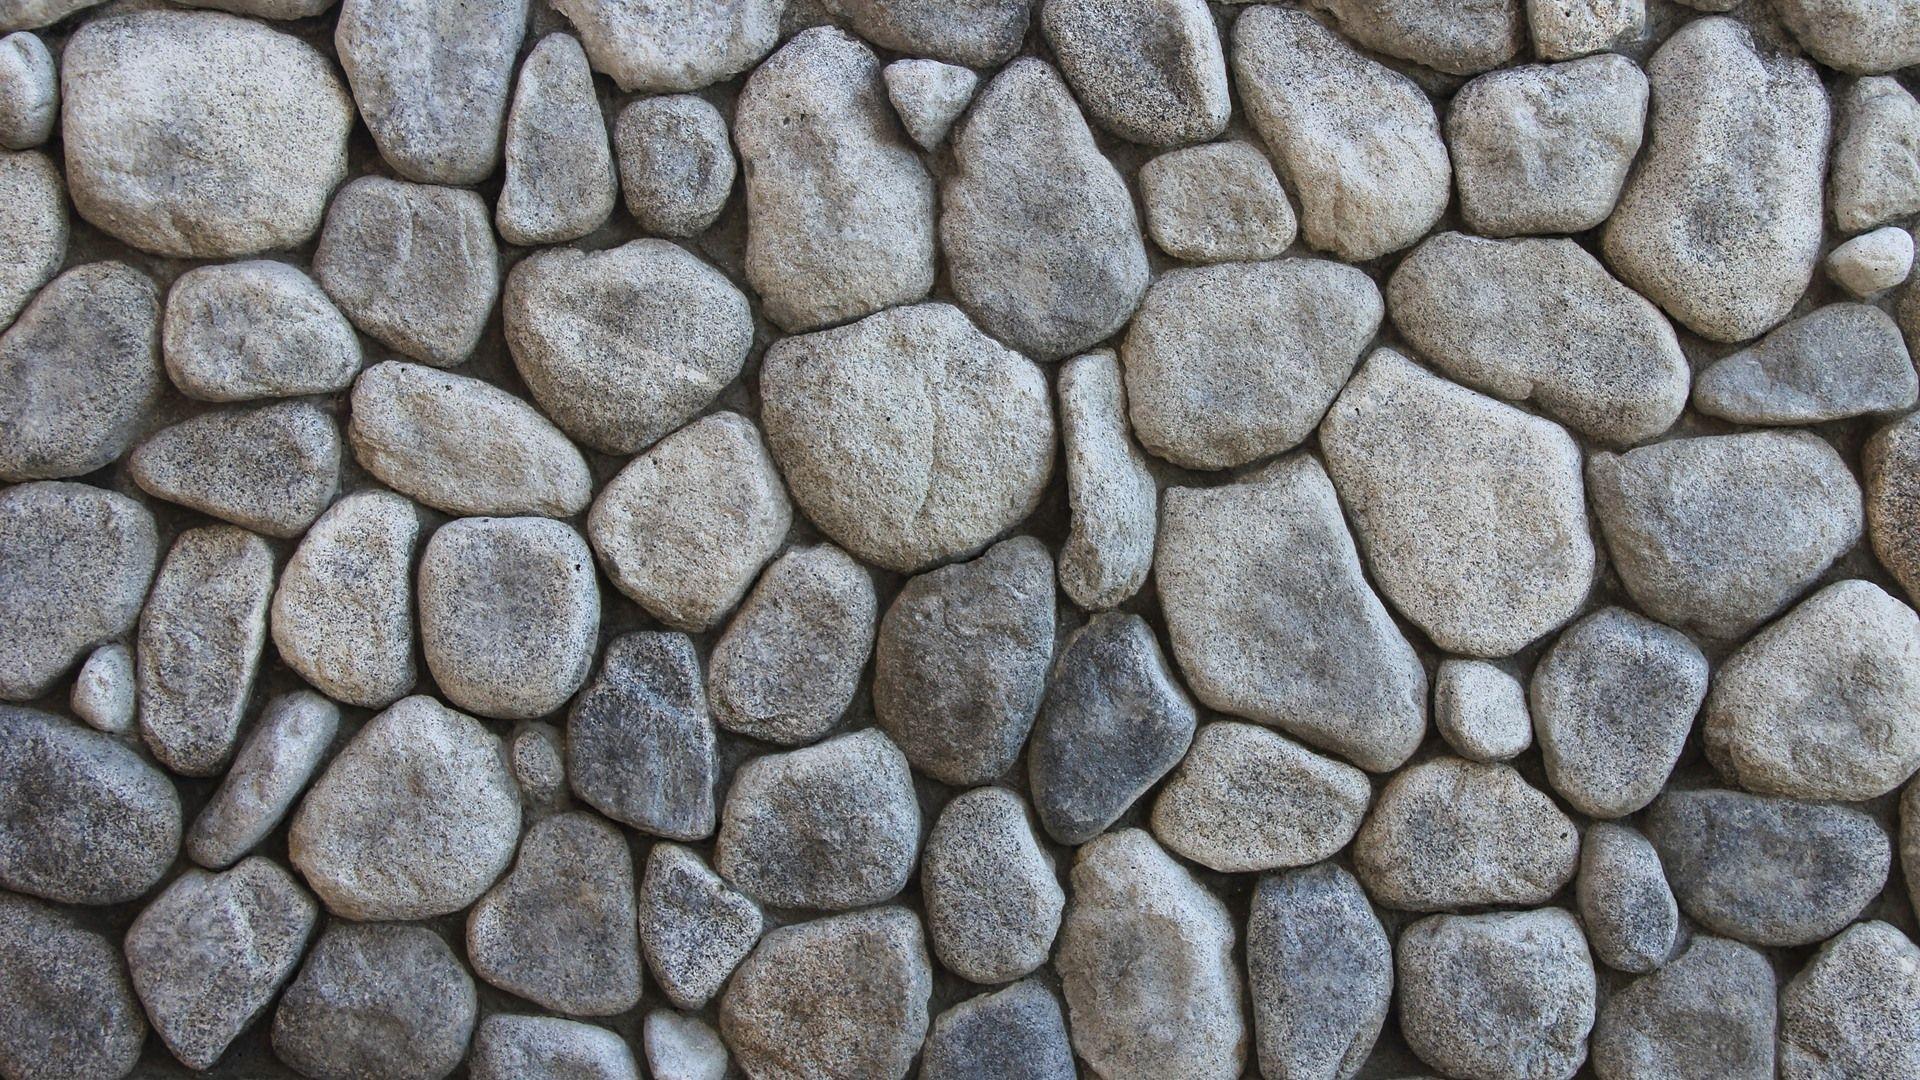 stone texture wallpaper 7213 dreamcatcher pinterest stone